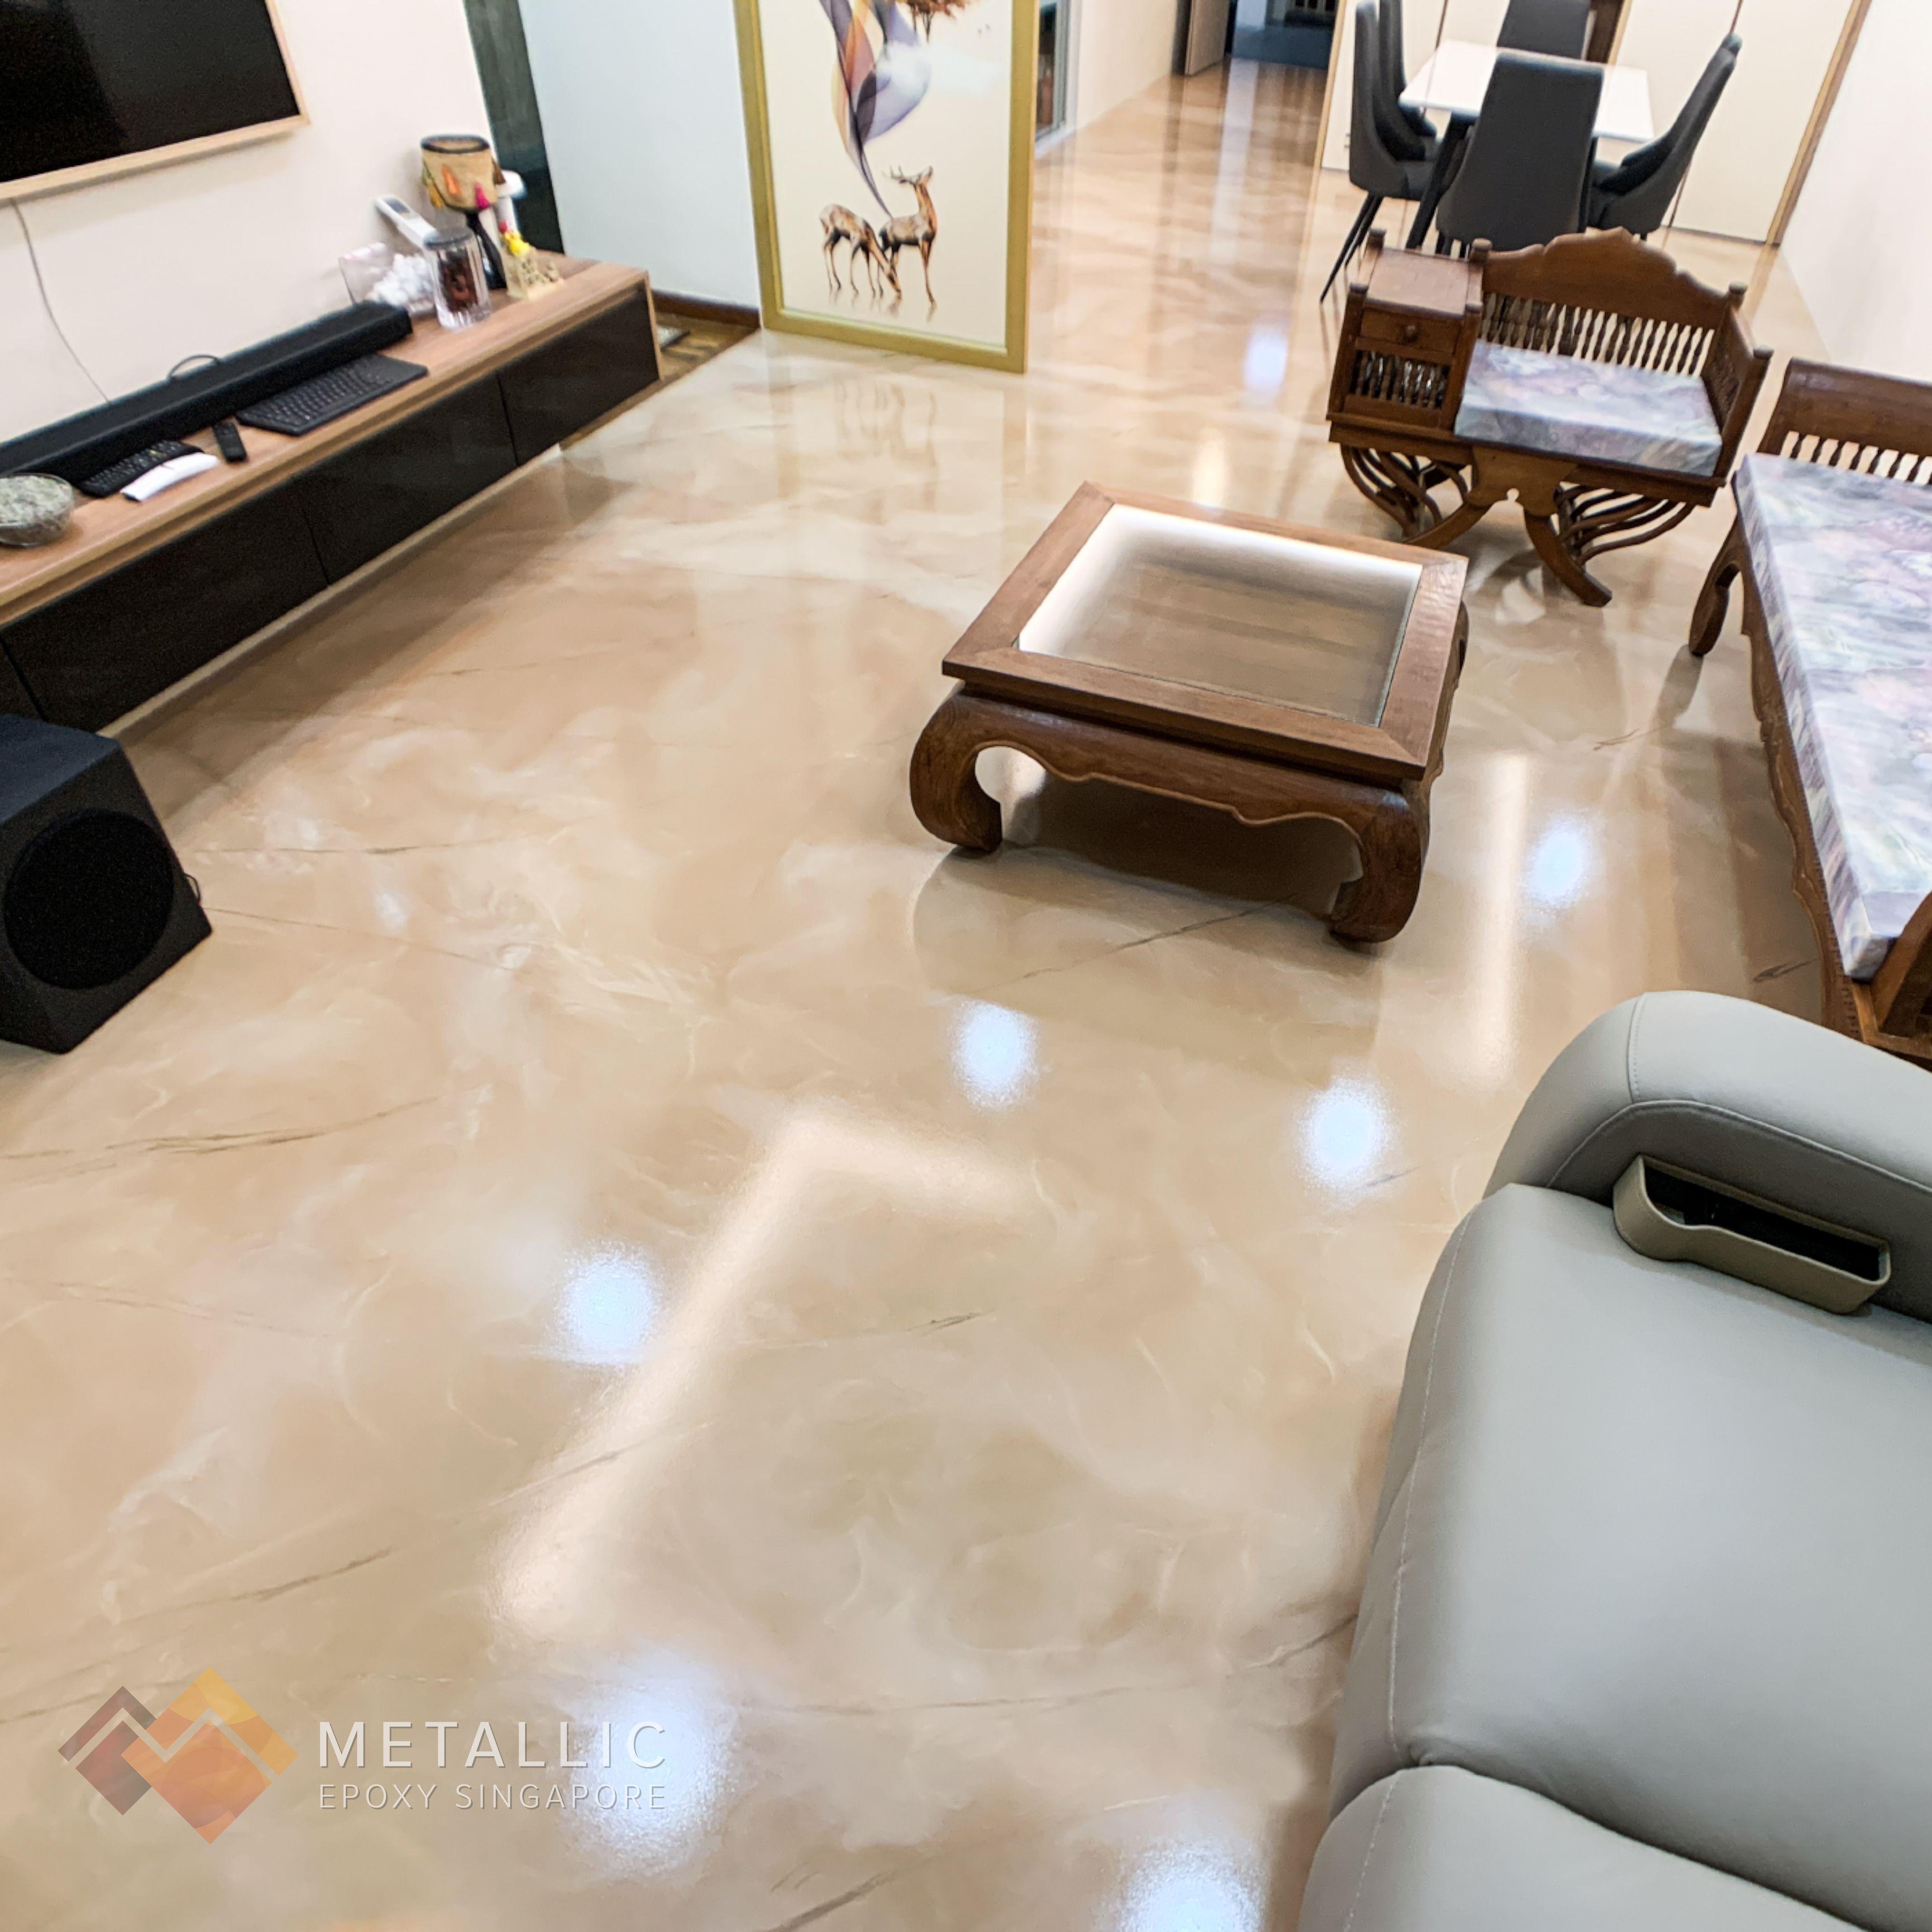 Metallic Epoxy Living Room Flooring Metallic Epoxy Floor Living Room Flooring Floor Design Living room epoxy floors in homes